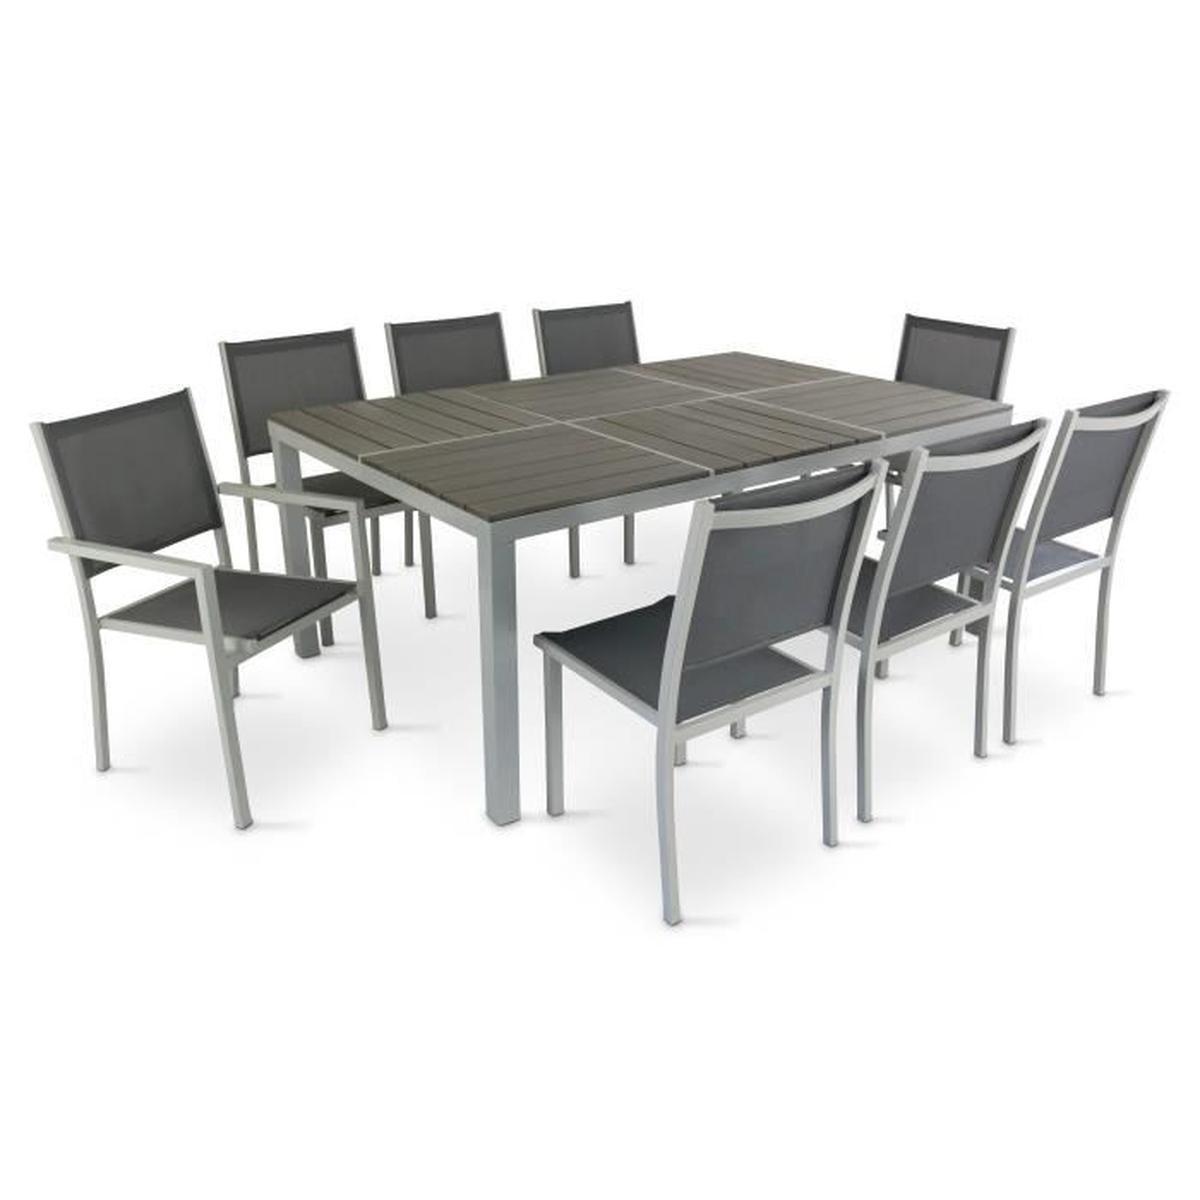 Table De Jardin En Aluminium Et Polywood + 8 Chaises - Achat ... concernant Table Et Chaise De Jardin En Aluminium